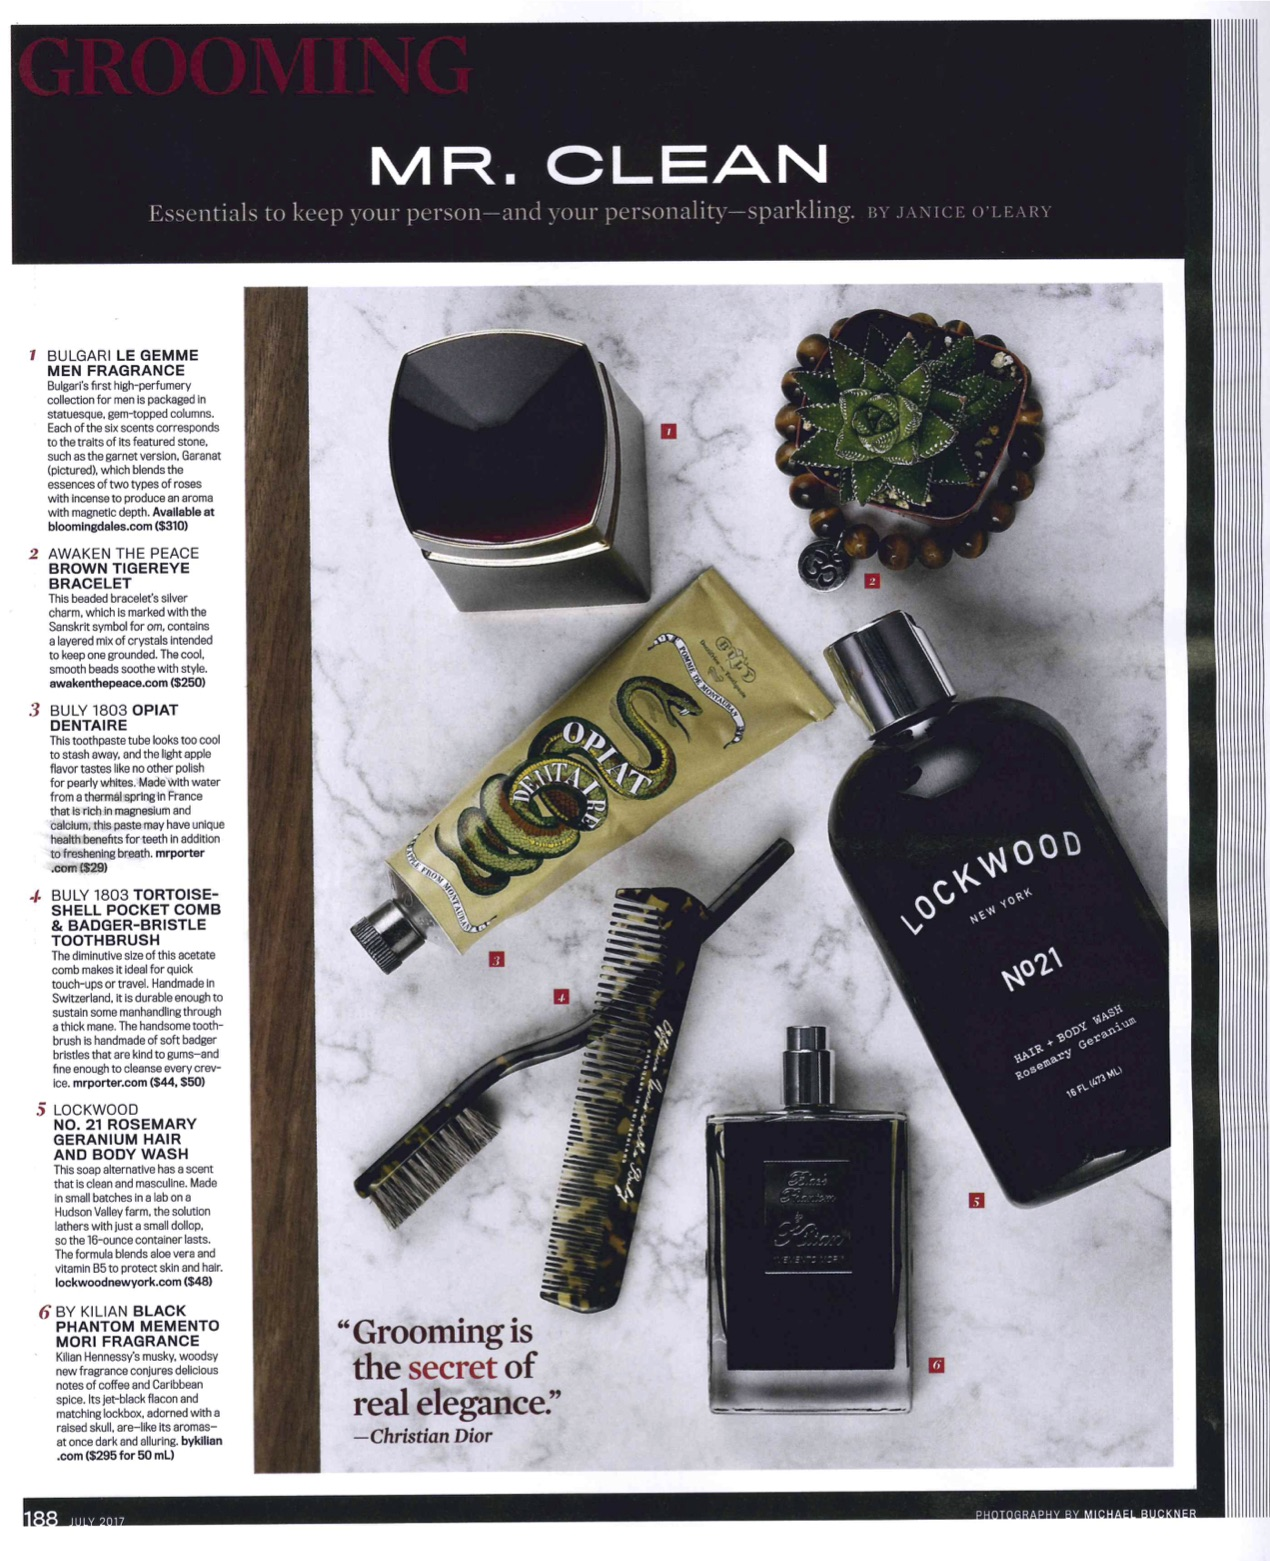 Robb Report: Mr Clean Essentials